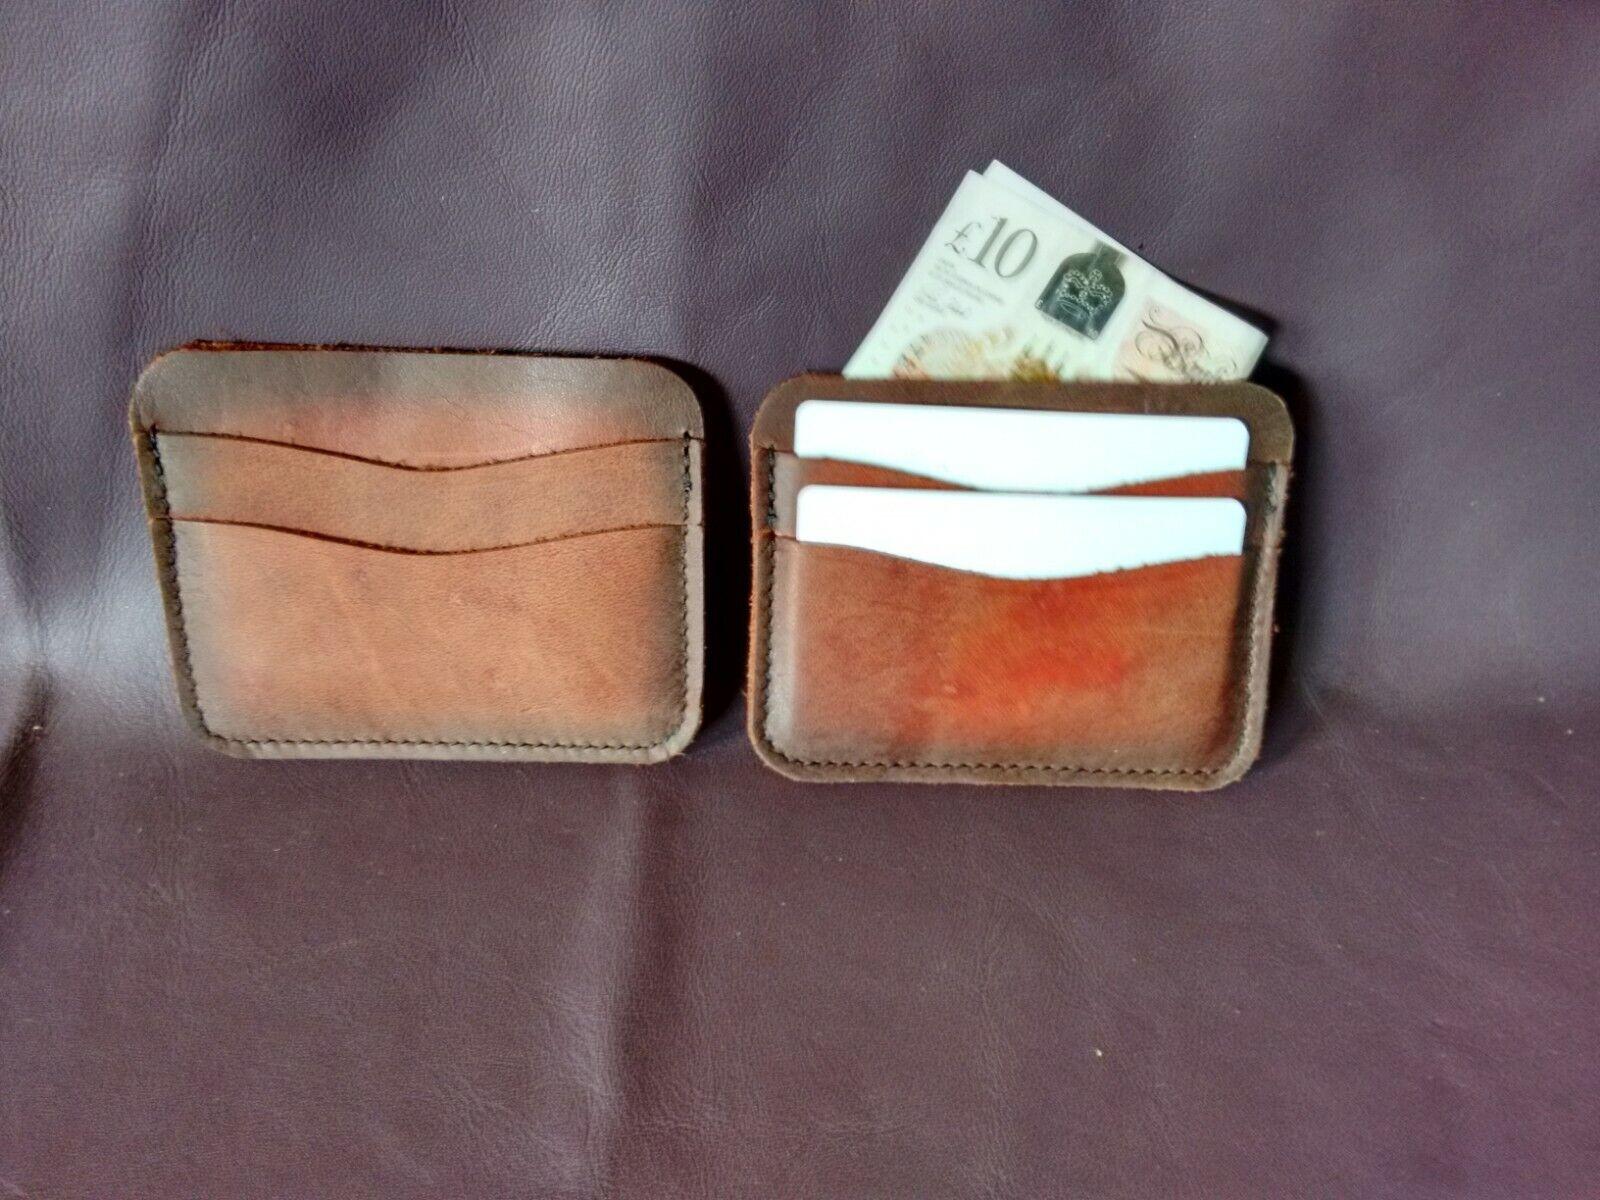 Leather card holder,rustic slim wallet,5 pockets with darkened edges, UK made